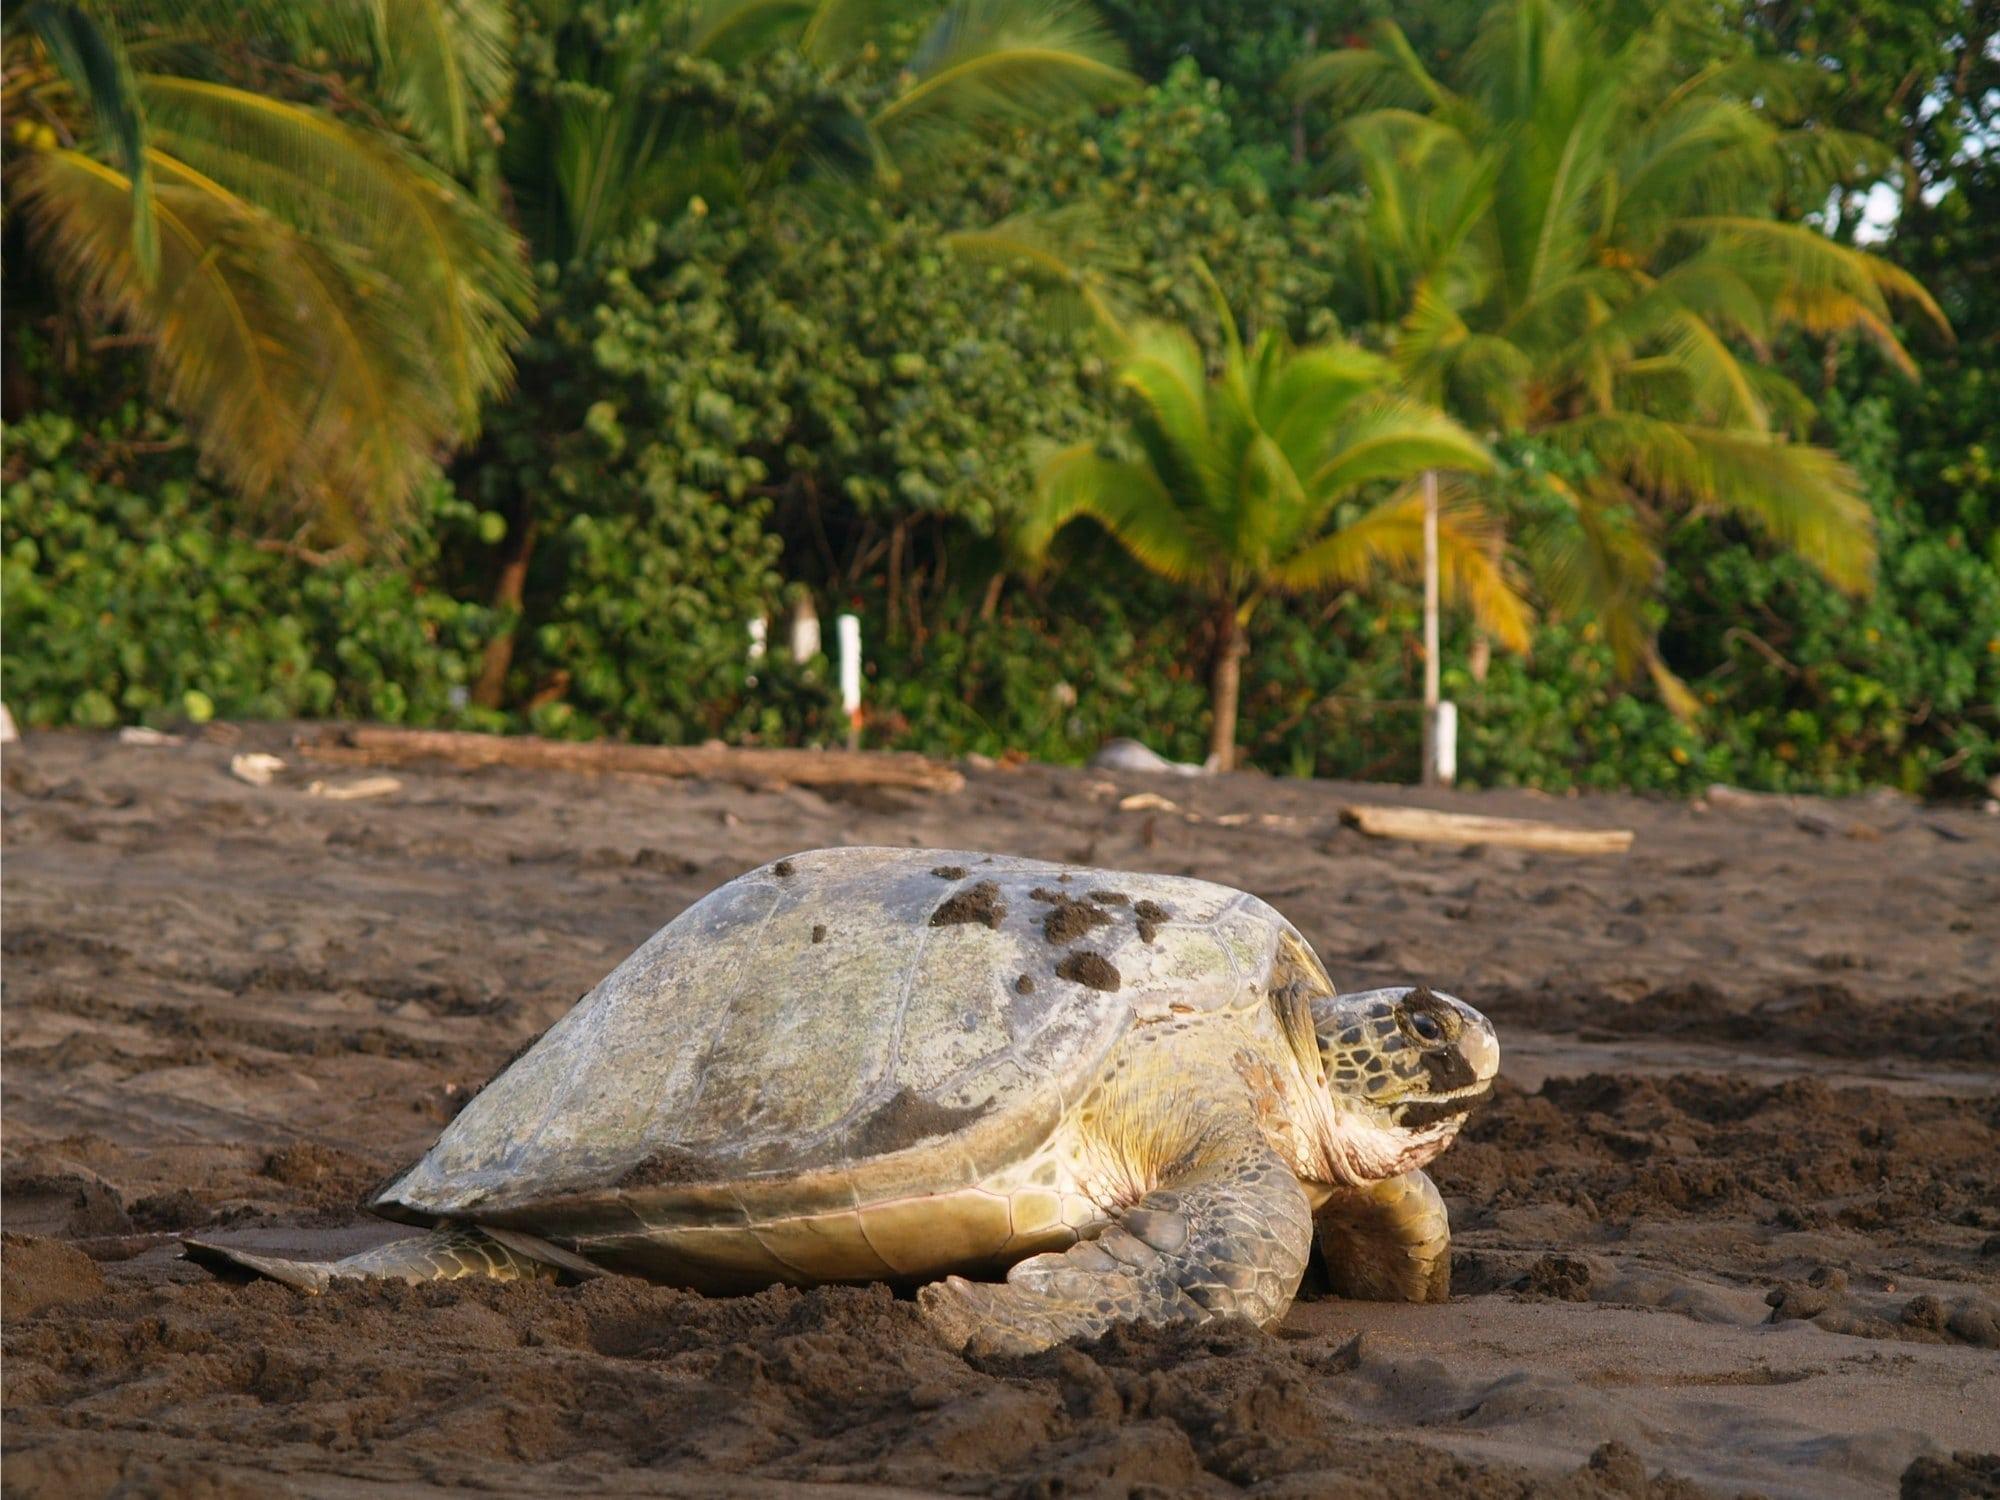 individuele-costa-rica-rondreis-tortuguero-min.jpg.pagespeed.ce.ZyipHap5i6.jpg